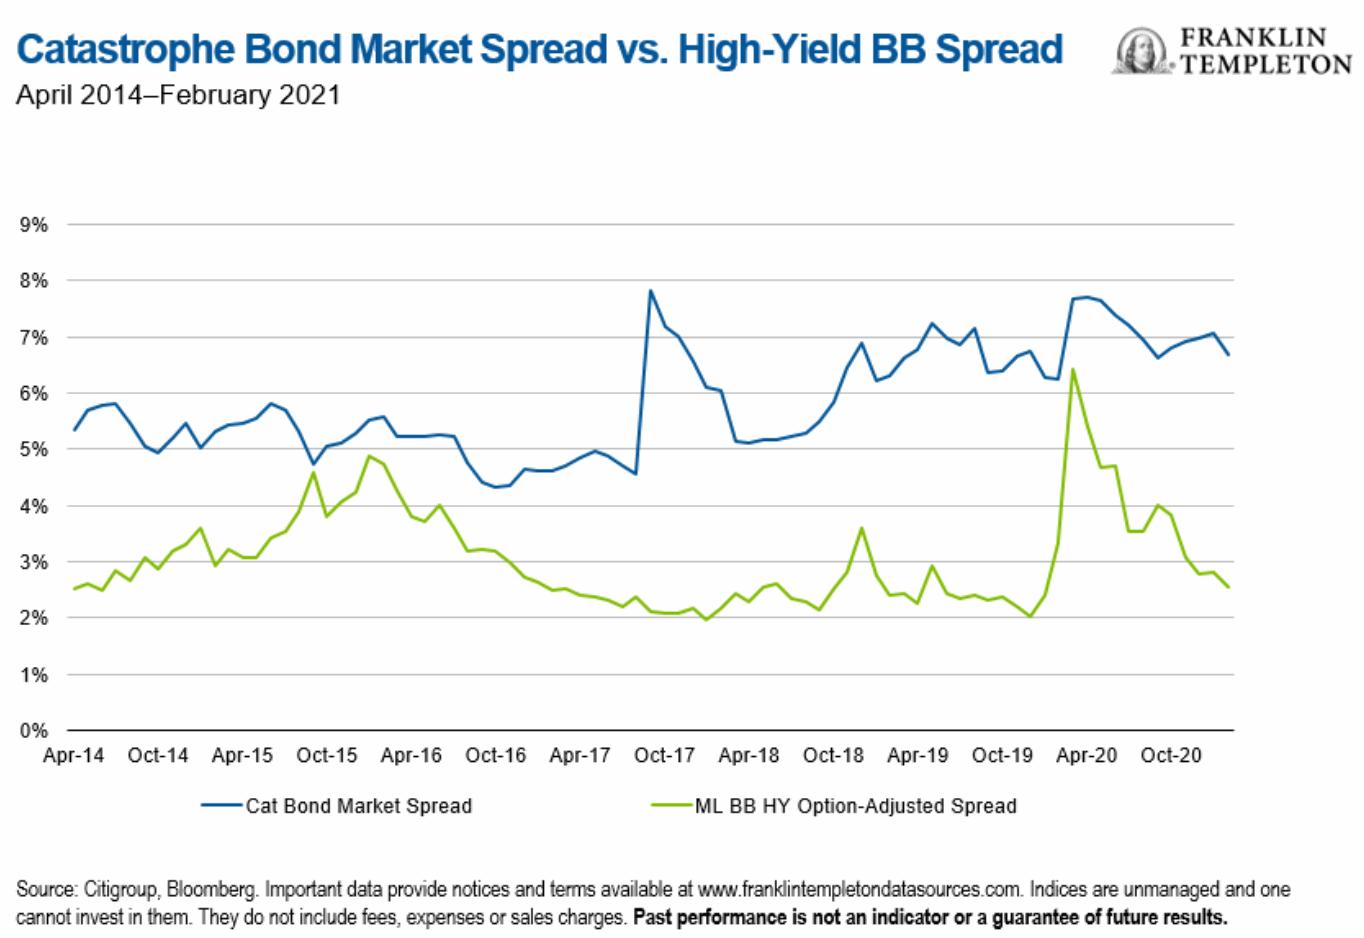 Catastrophe bond spreads vs high yield corporate bonds